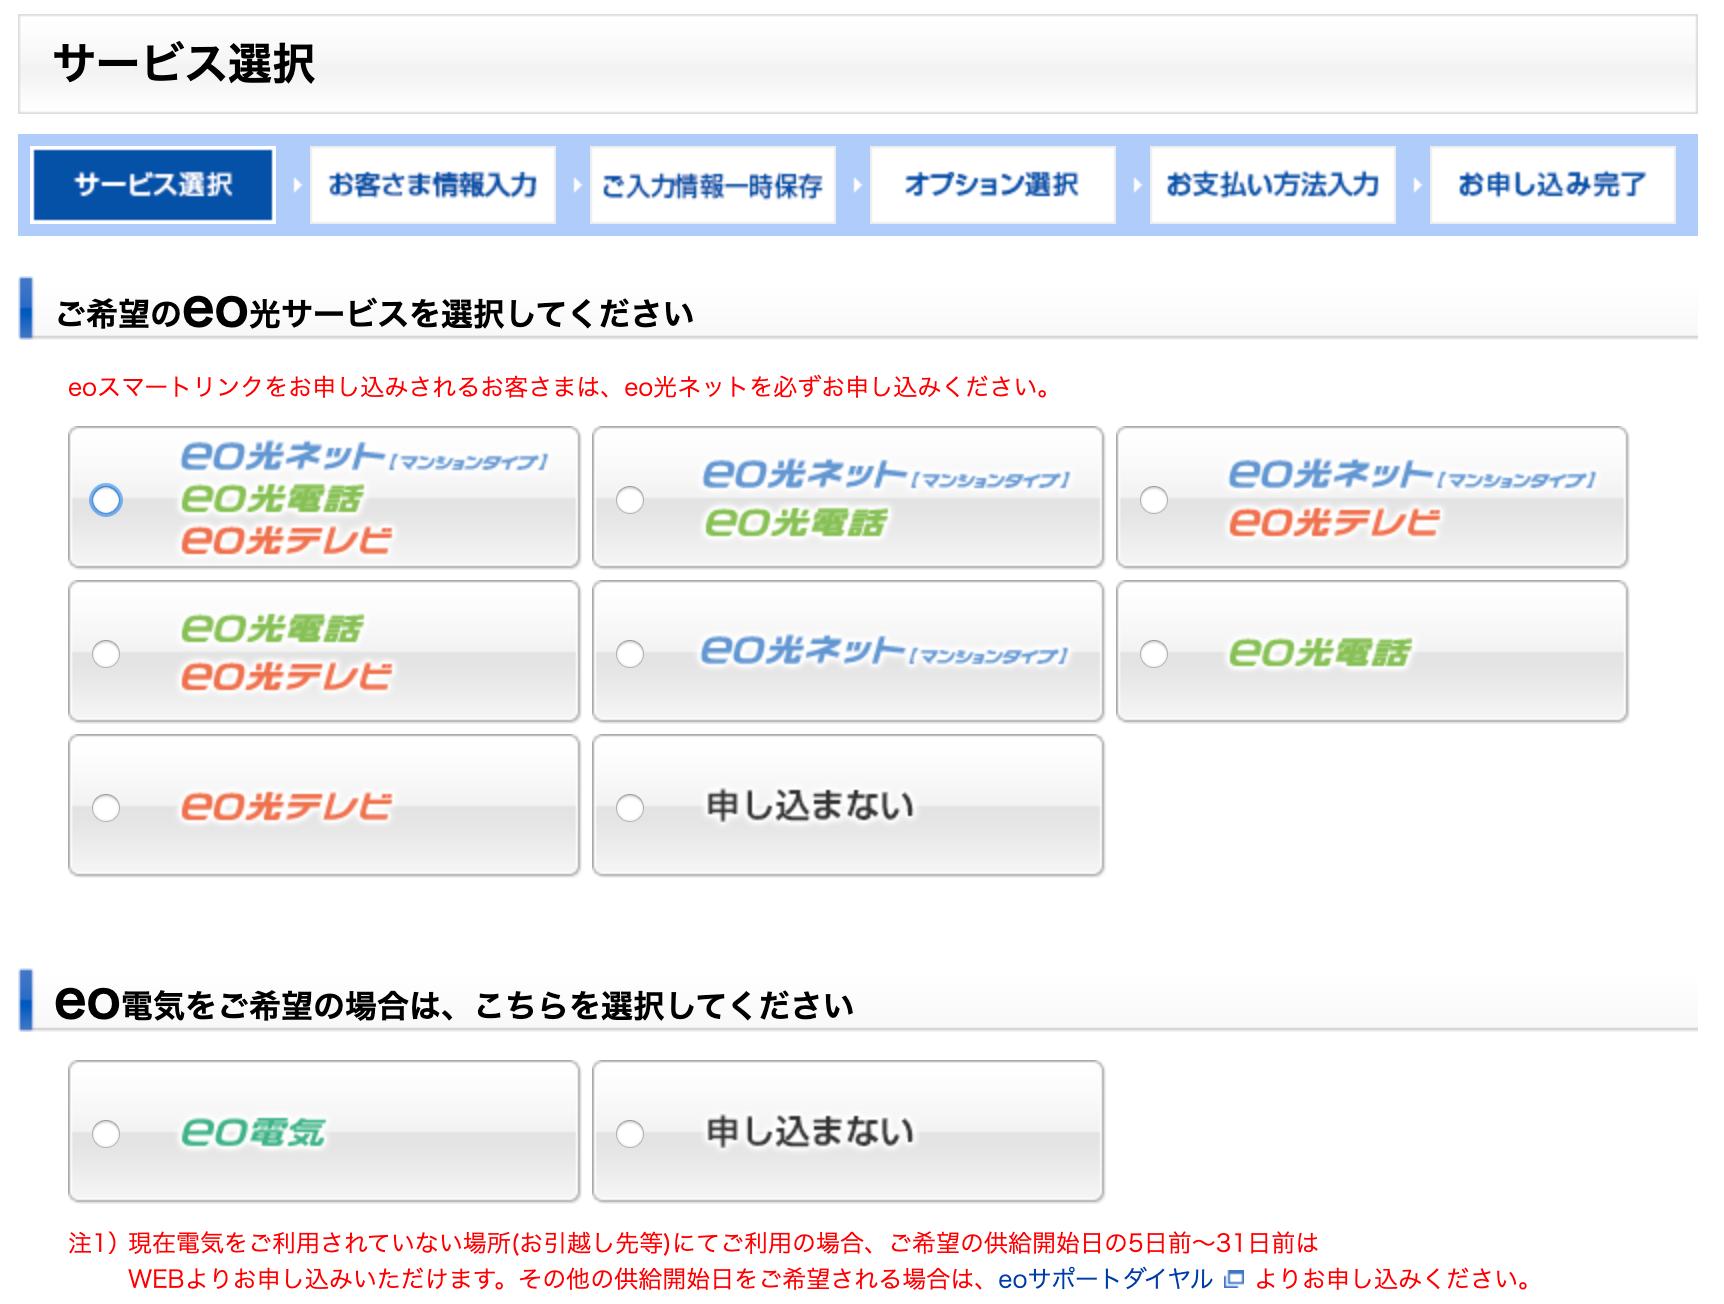 eo光サービス選択